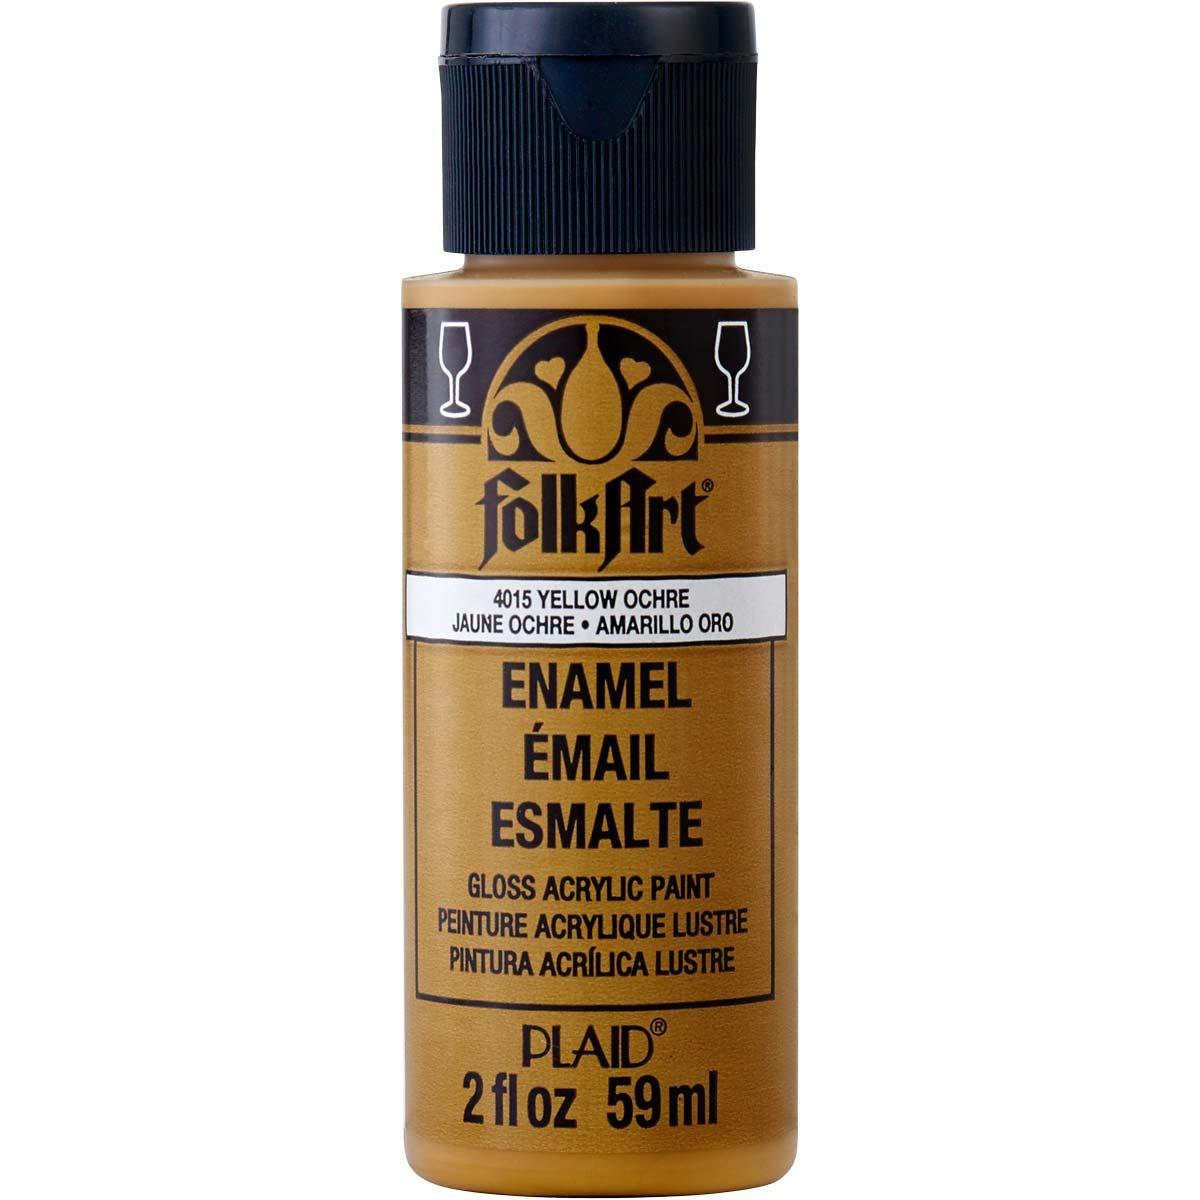 FolkArt ® Enamels™ - Yellow Ochre, 2 oz. - 4015